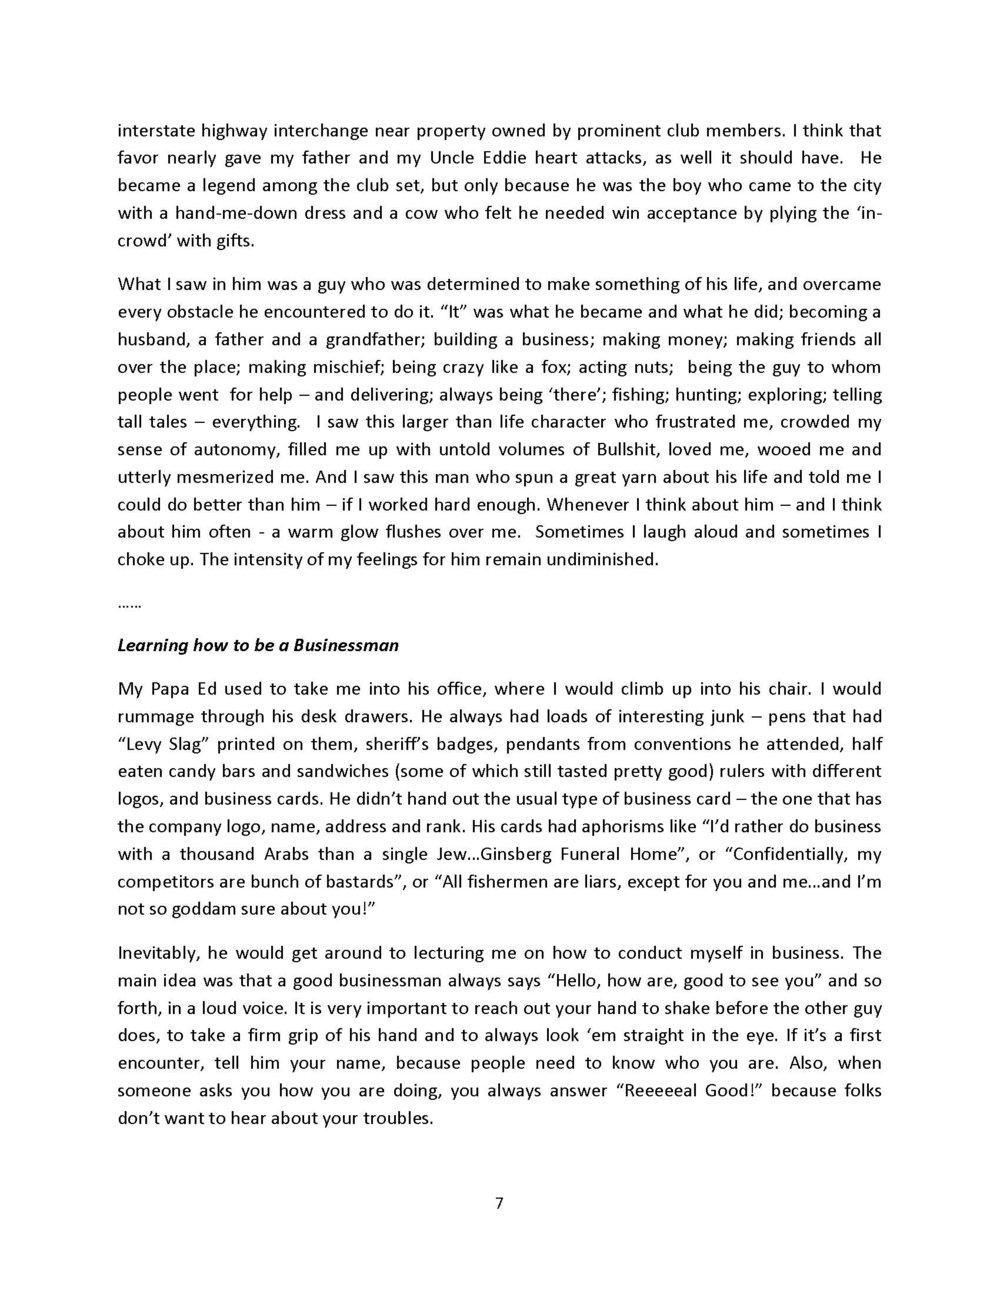 Papa Ed Stories -excerpts_Page_07.jpg